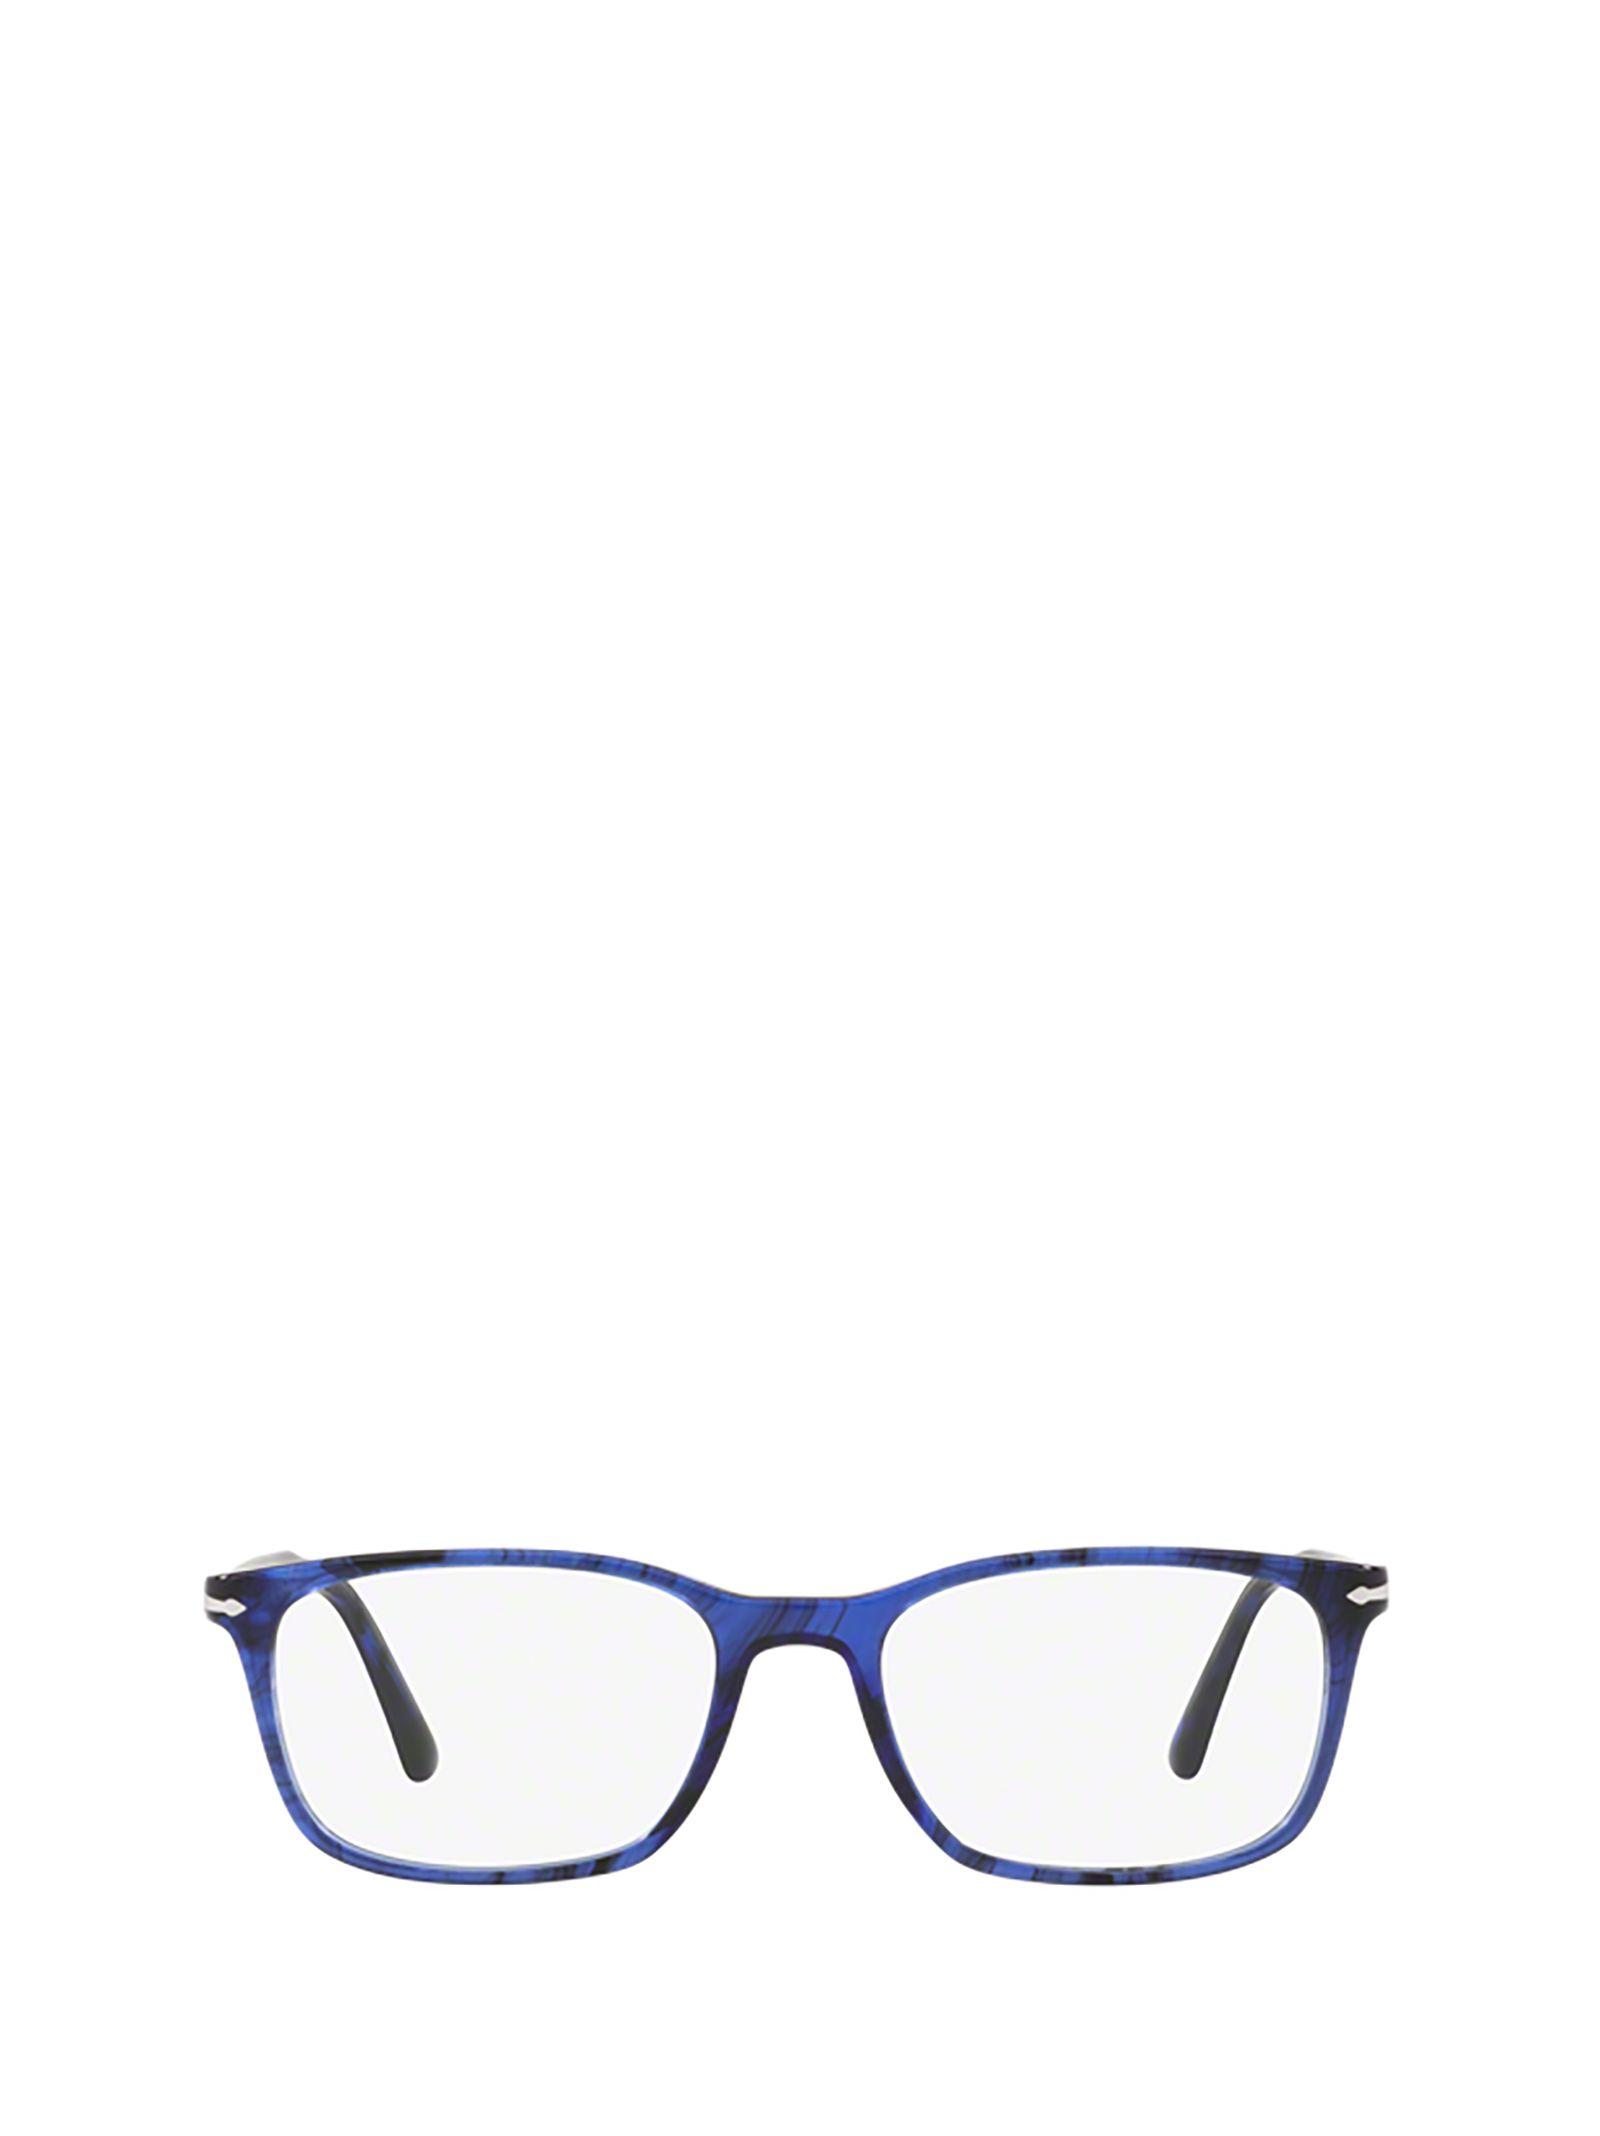 Persol Men's Blue Acetate Glasses